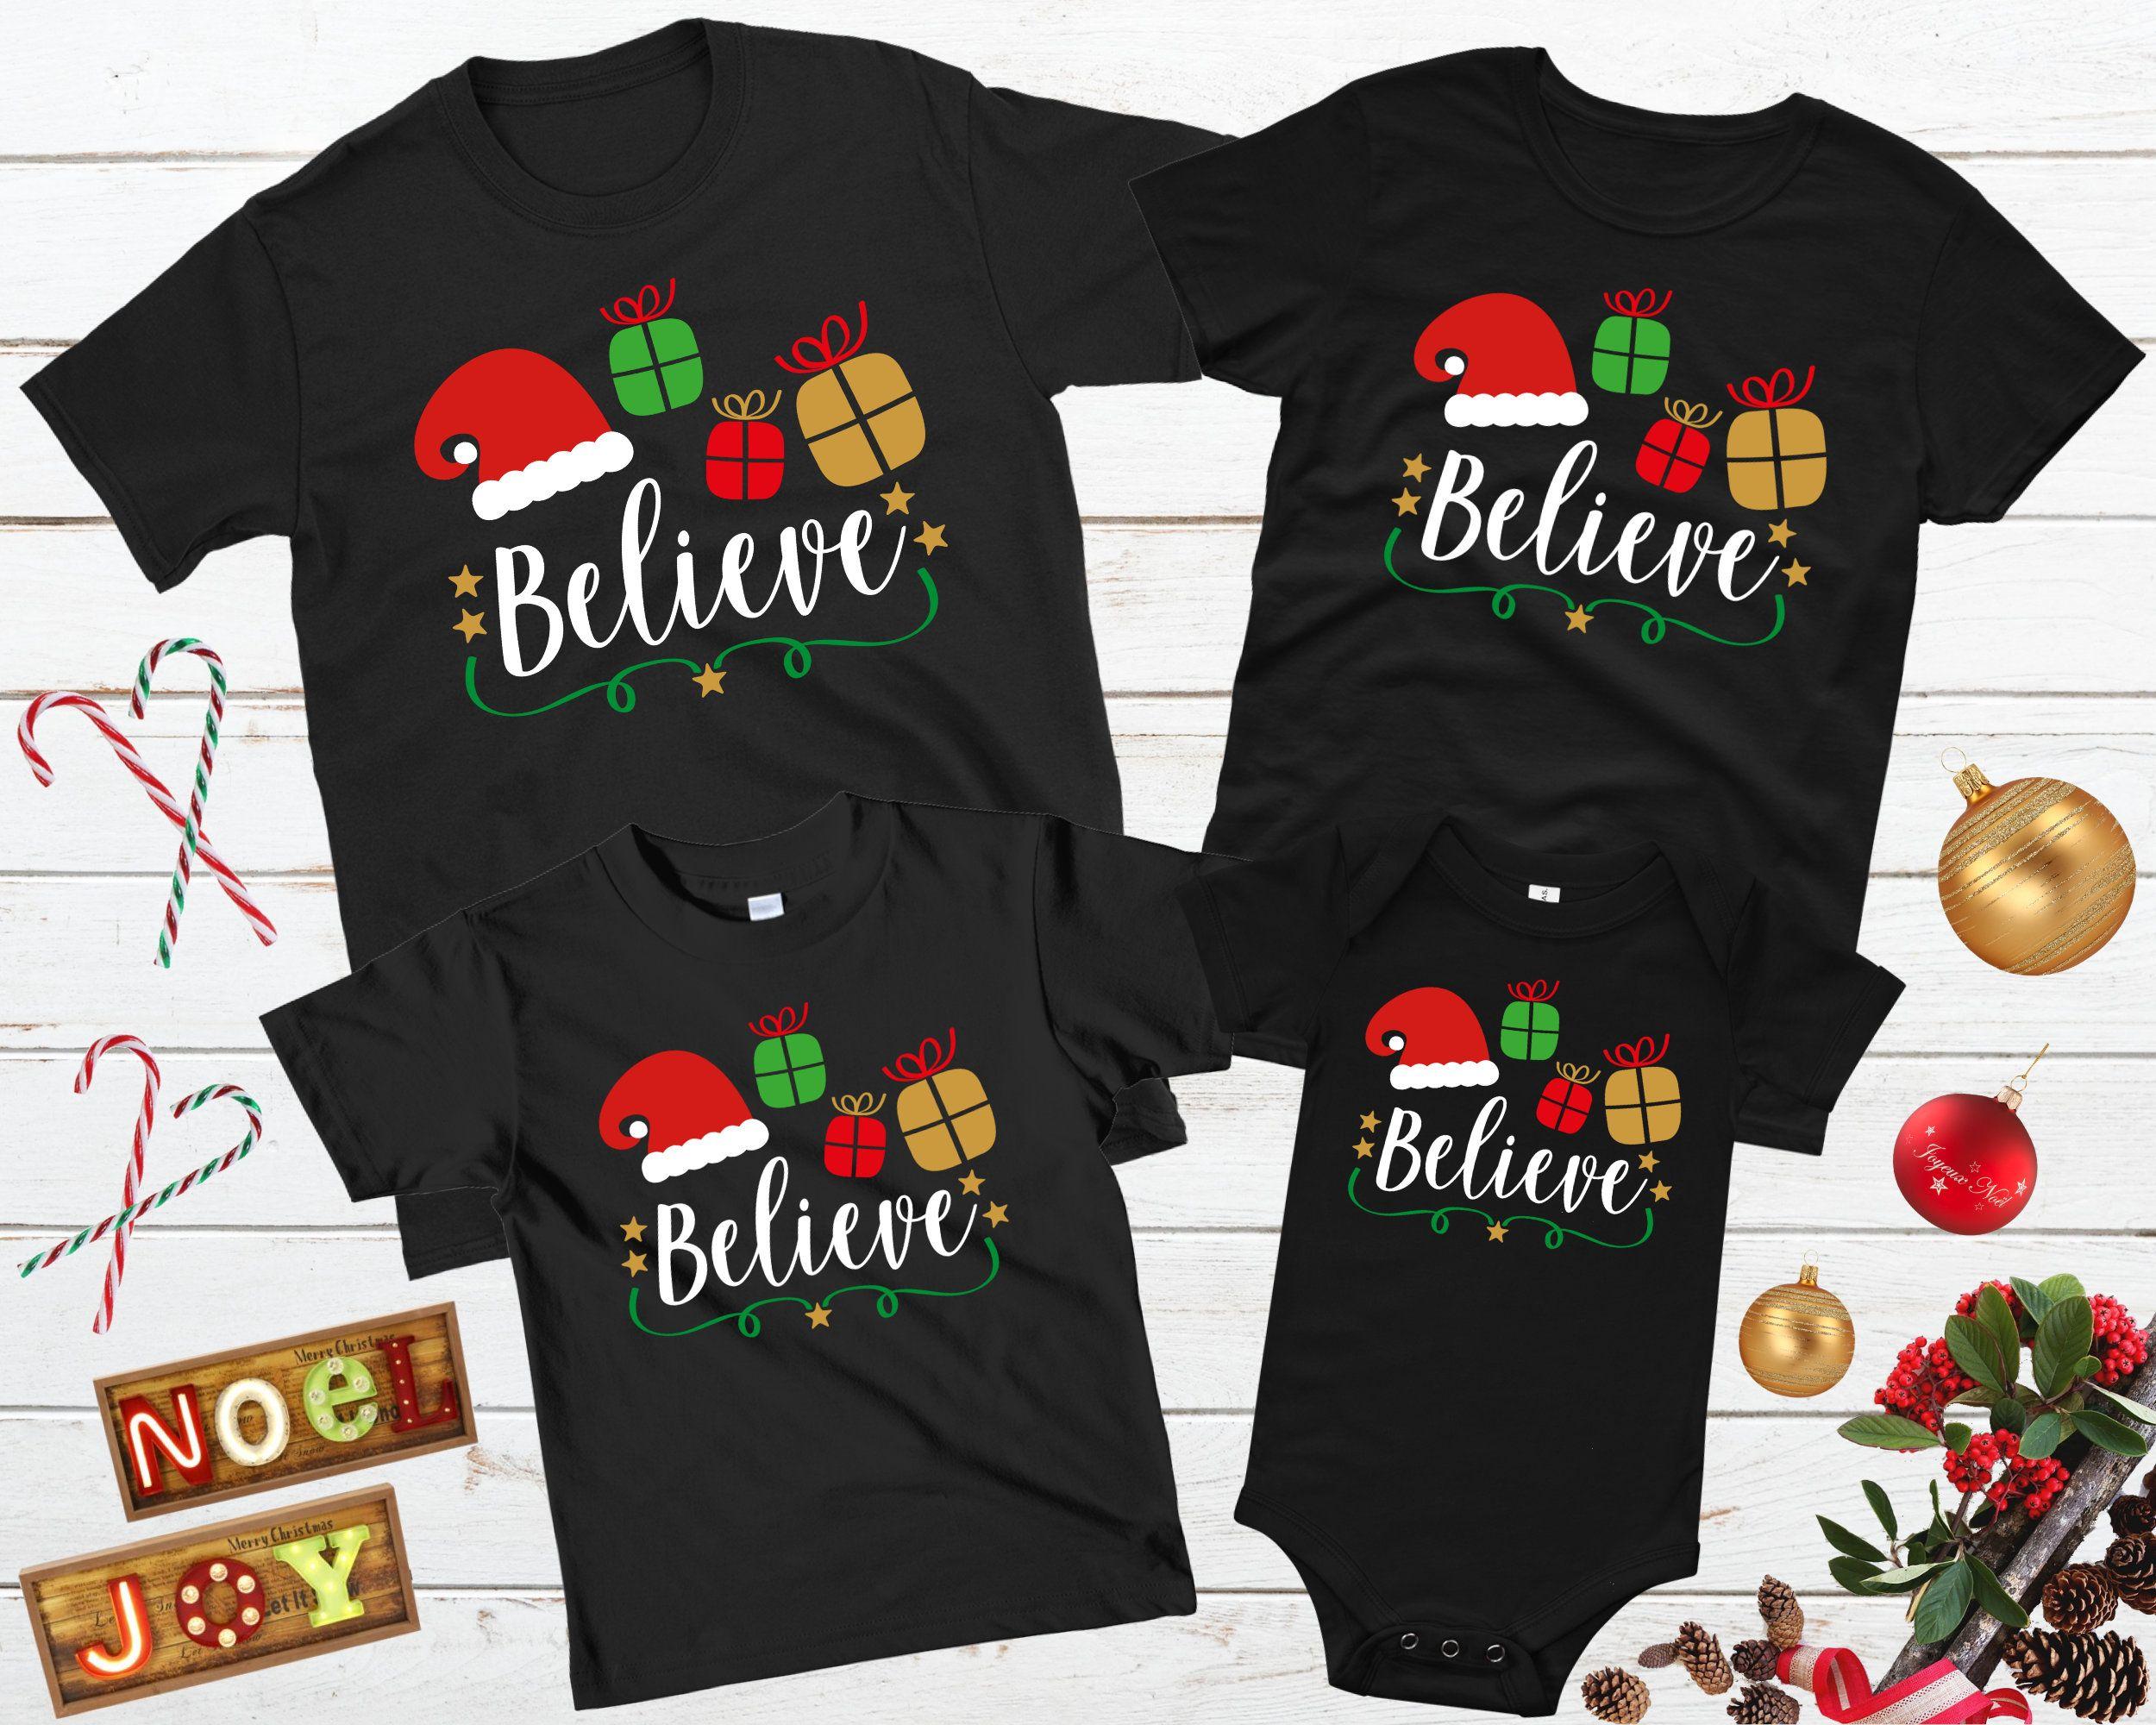 Christmas Believe T-shirt Christmas Family Shirts Christmas Trendy Kids Christmas Shirts for gift Merry Christmas Believe Christmas Shirt